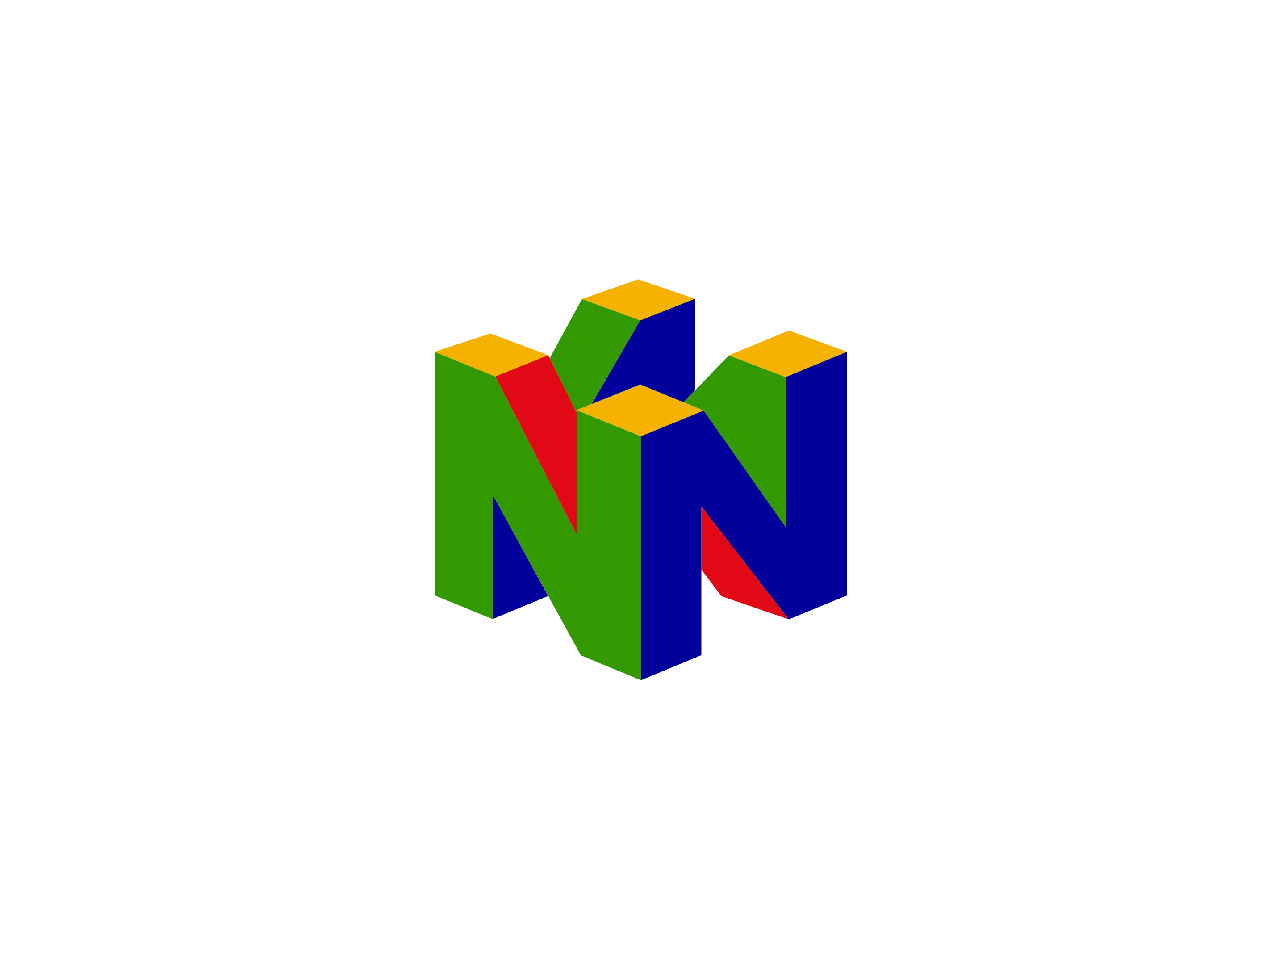 Nintendo 64 Logo 41559 1280x960 px ~ HDWallSource.com